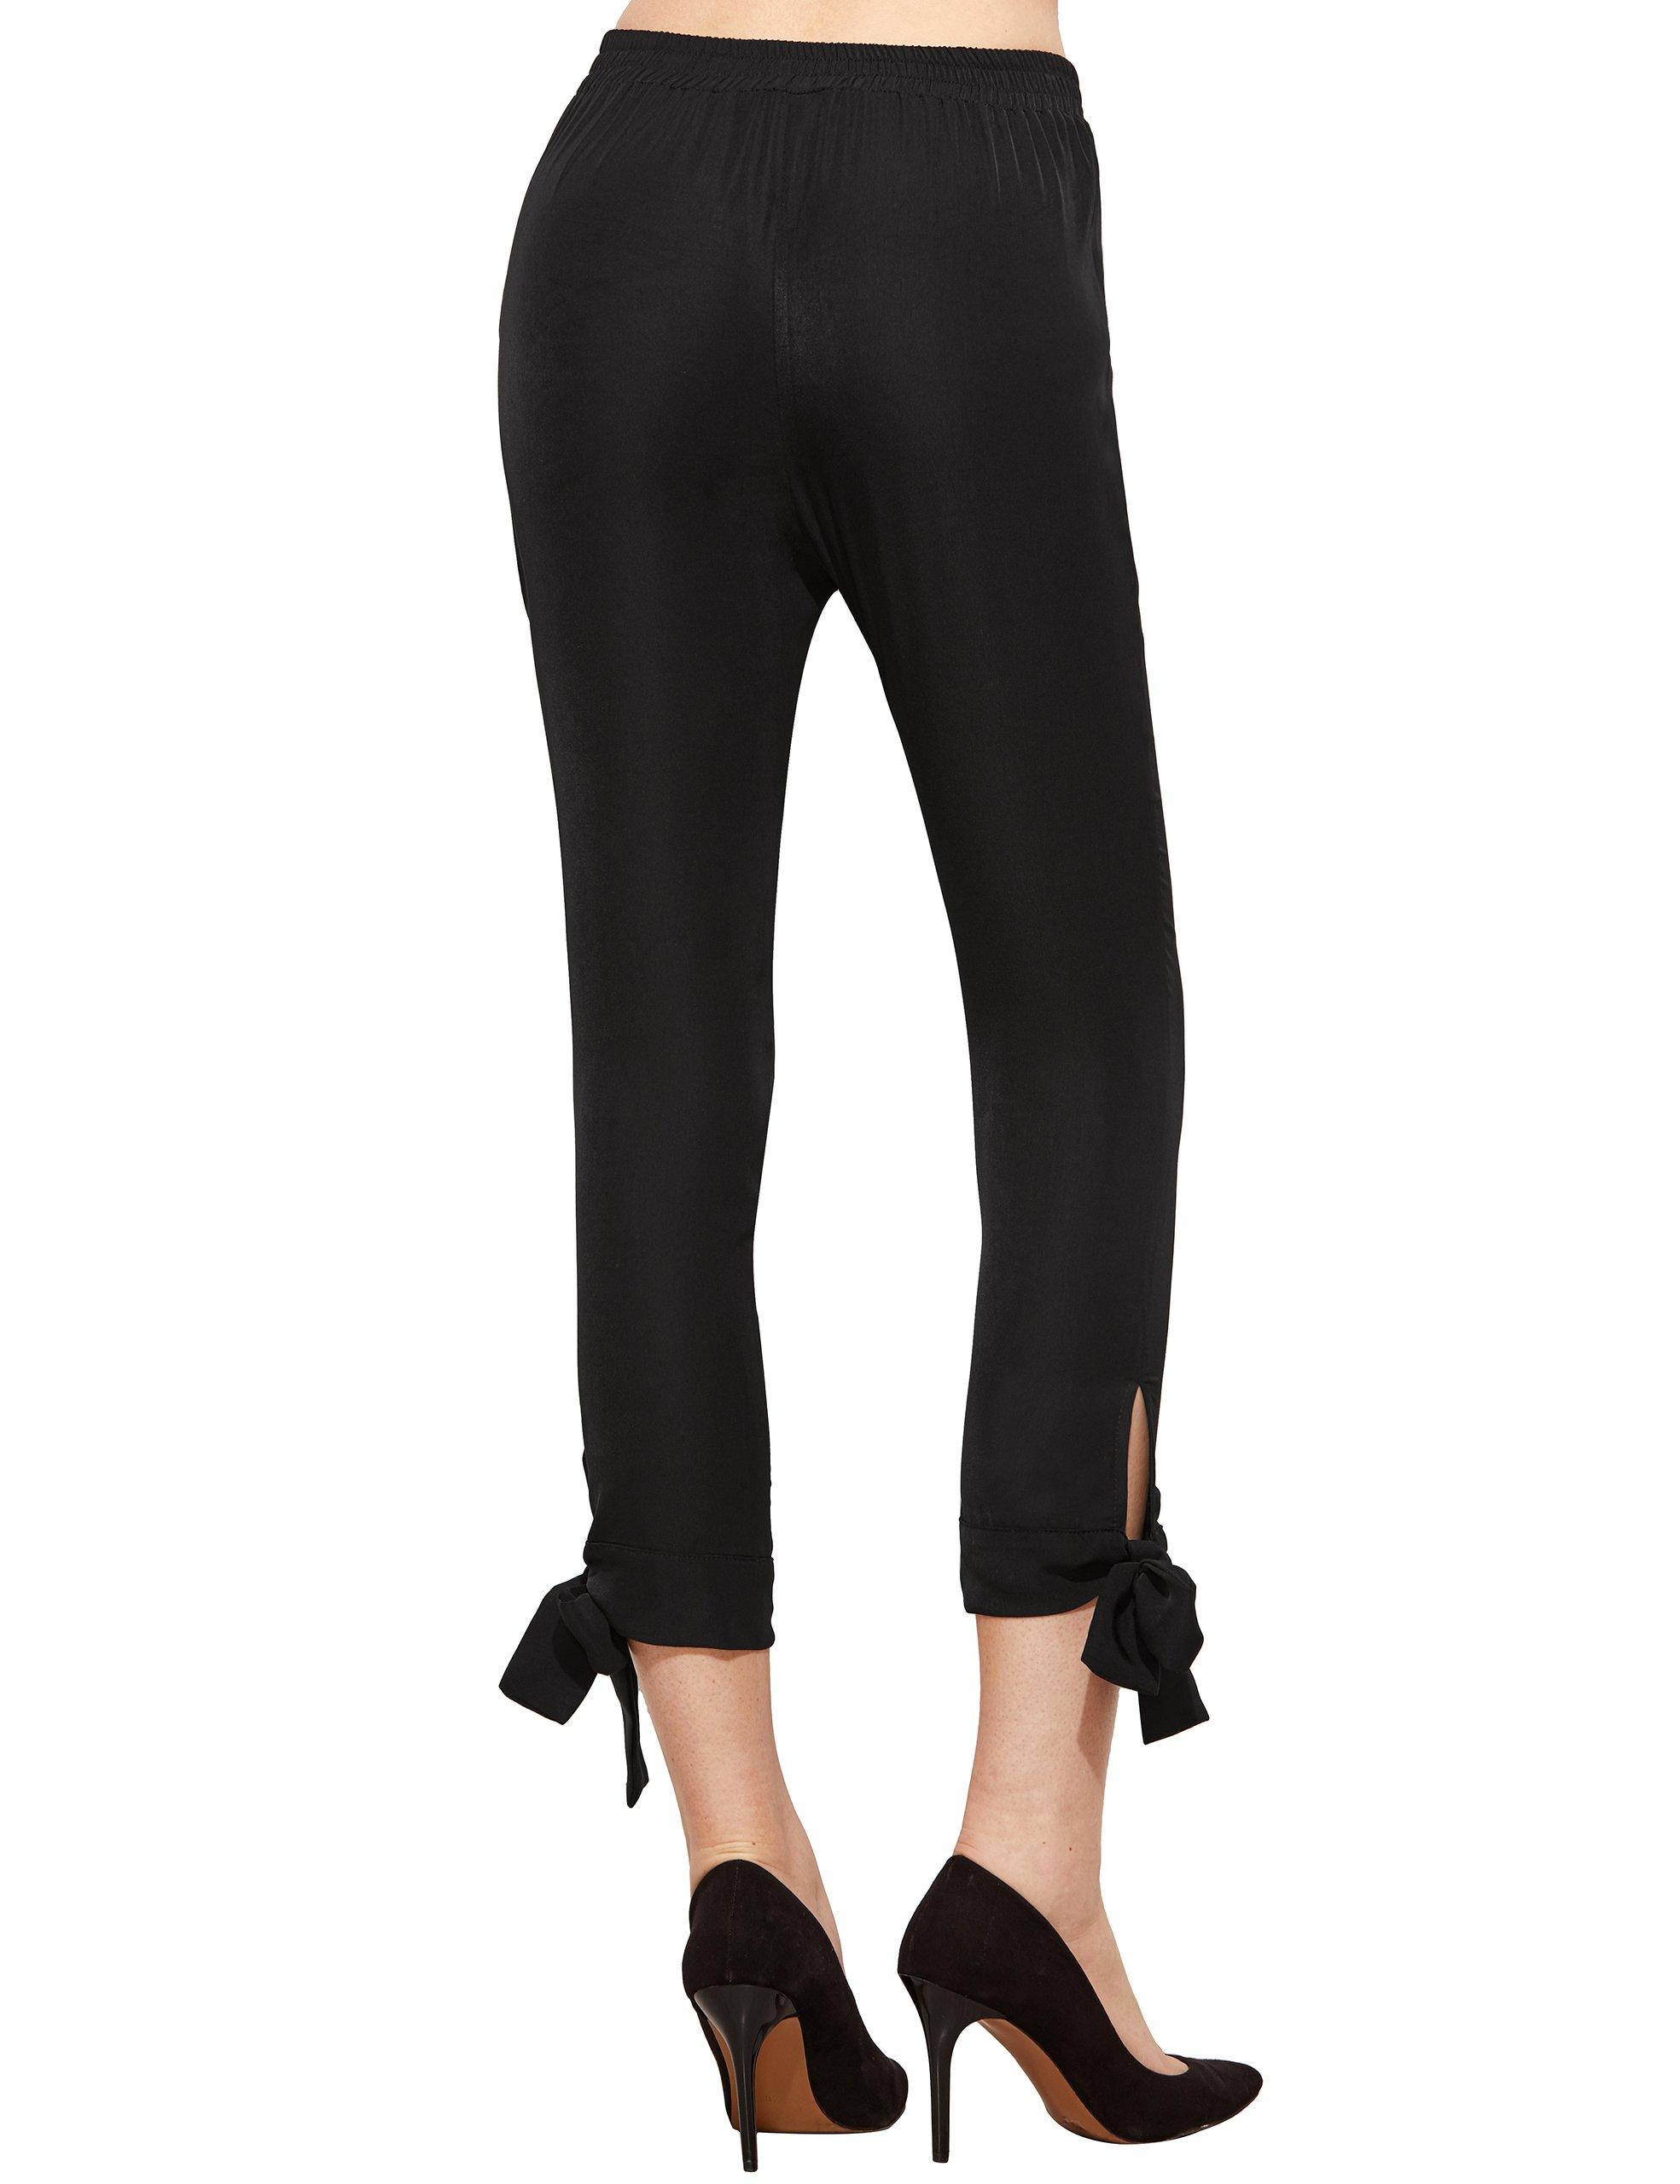 SheIn Women's Elastic Waist Comfy Bow Tie Hem Crop Skinny Pants with Pockets Small Black by SheIn (Image #3)